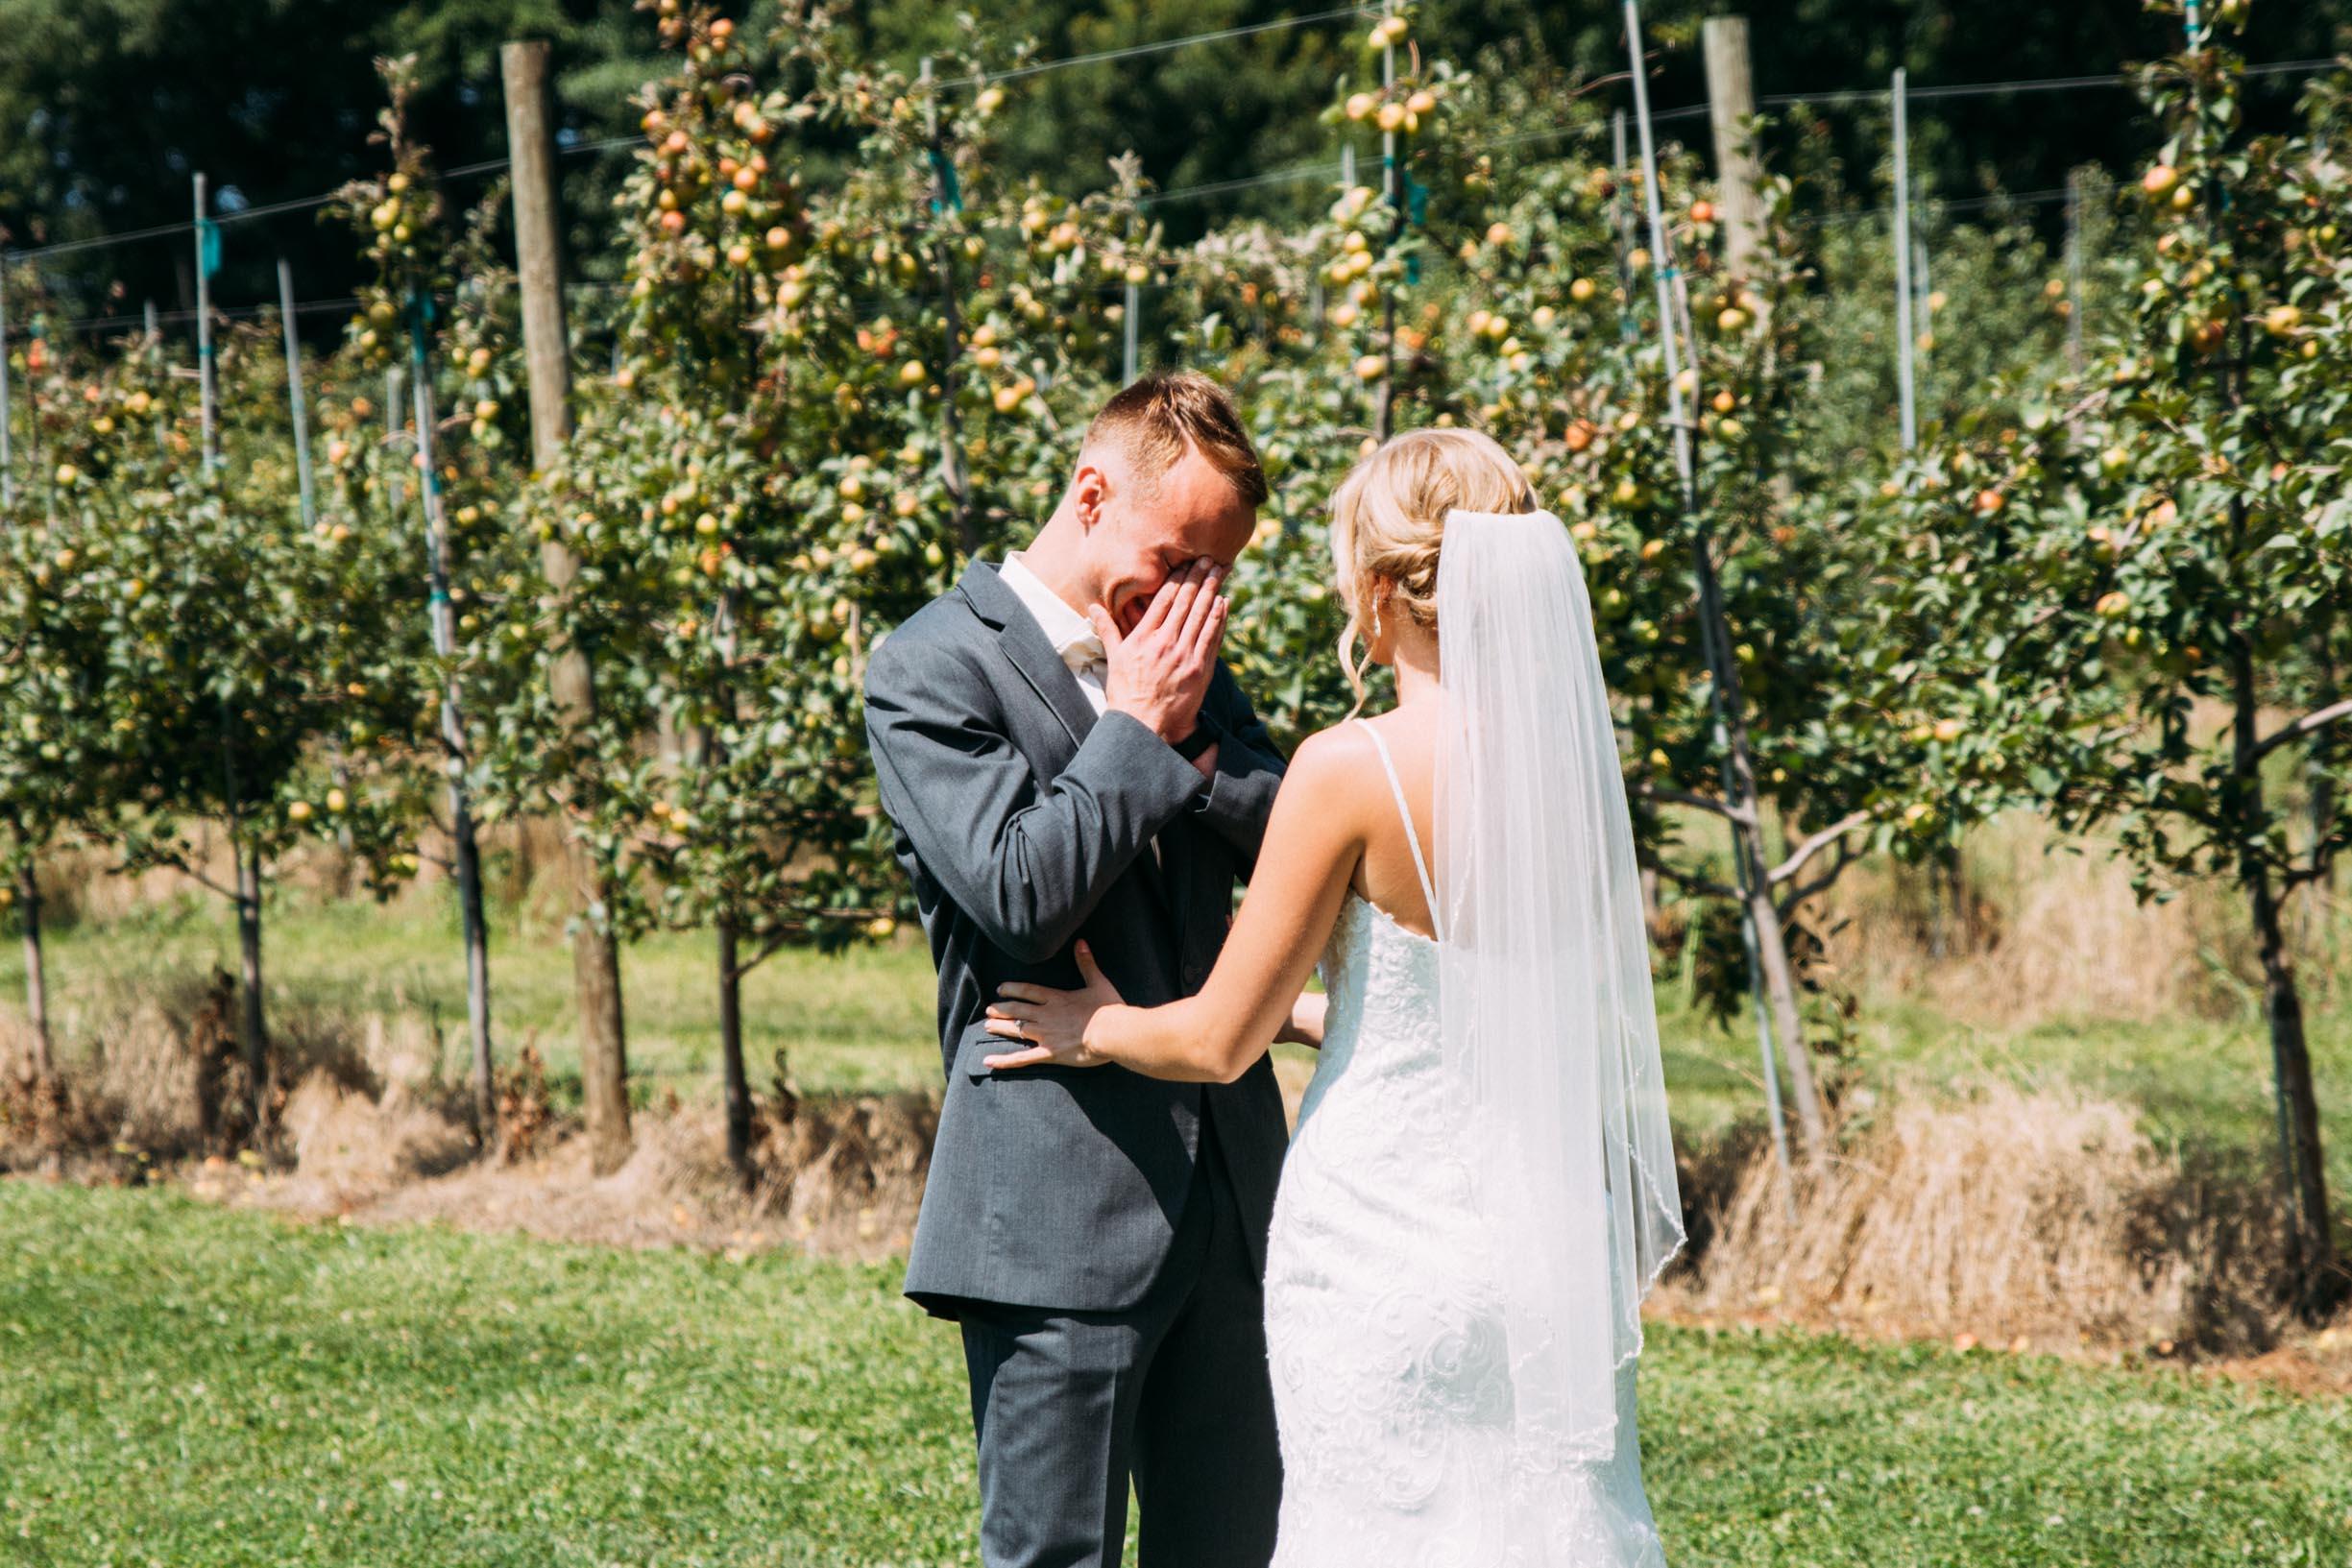 7-Minnetonka Orchards Wedding First Look Ashley Bryce Blog.jpg